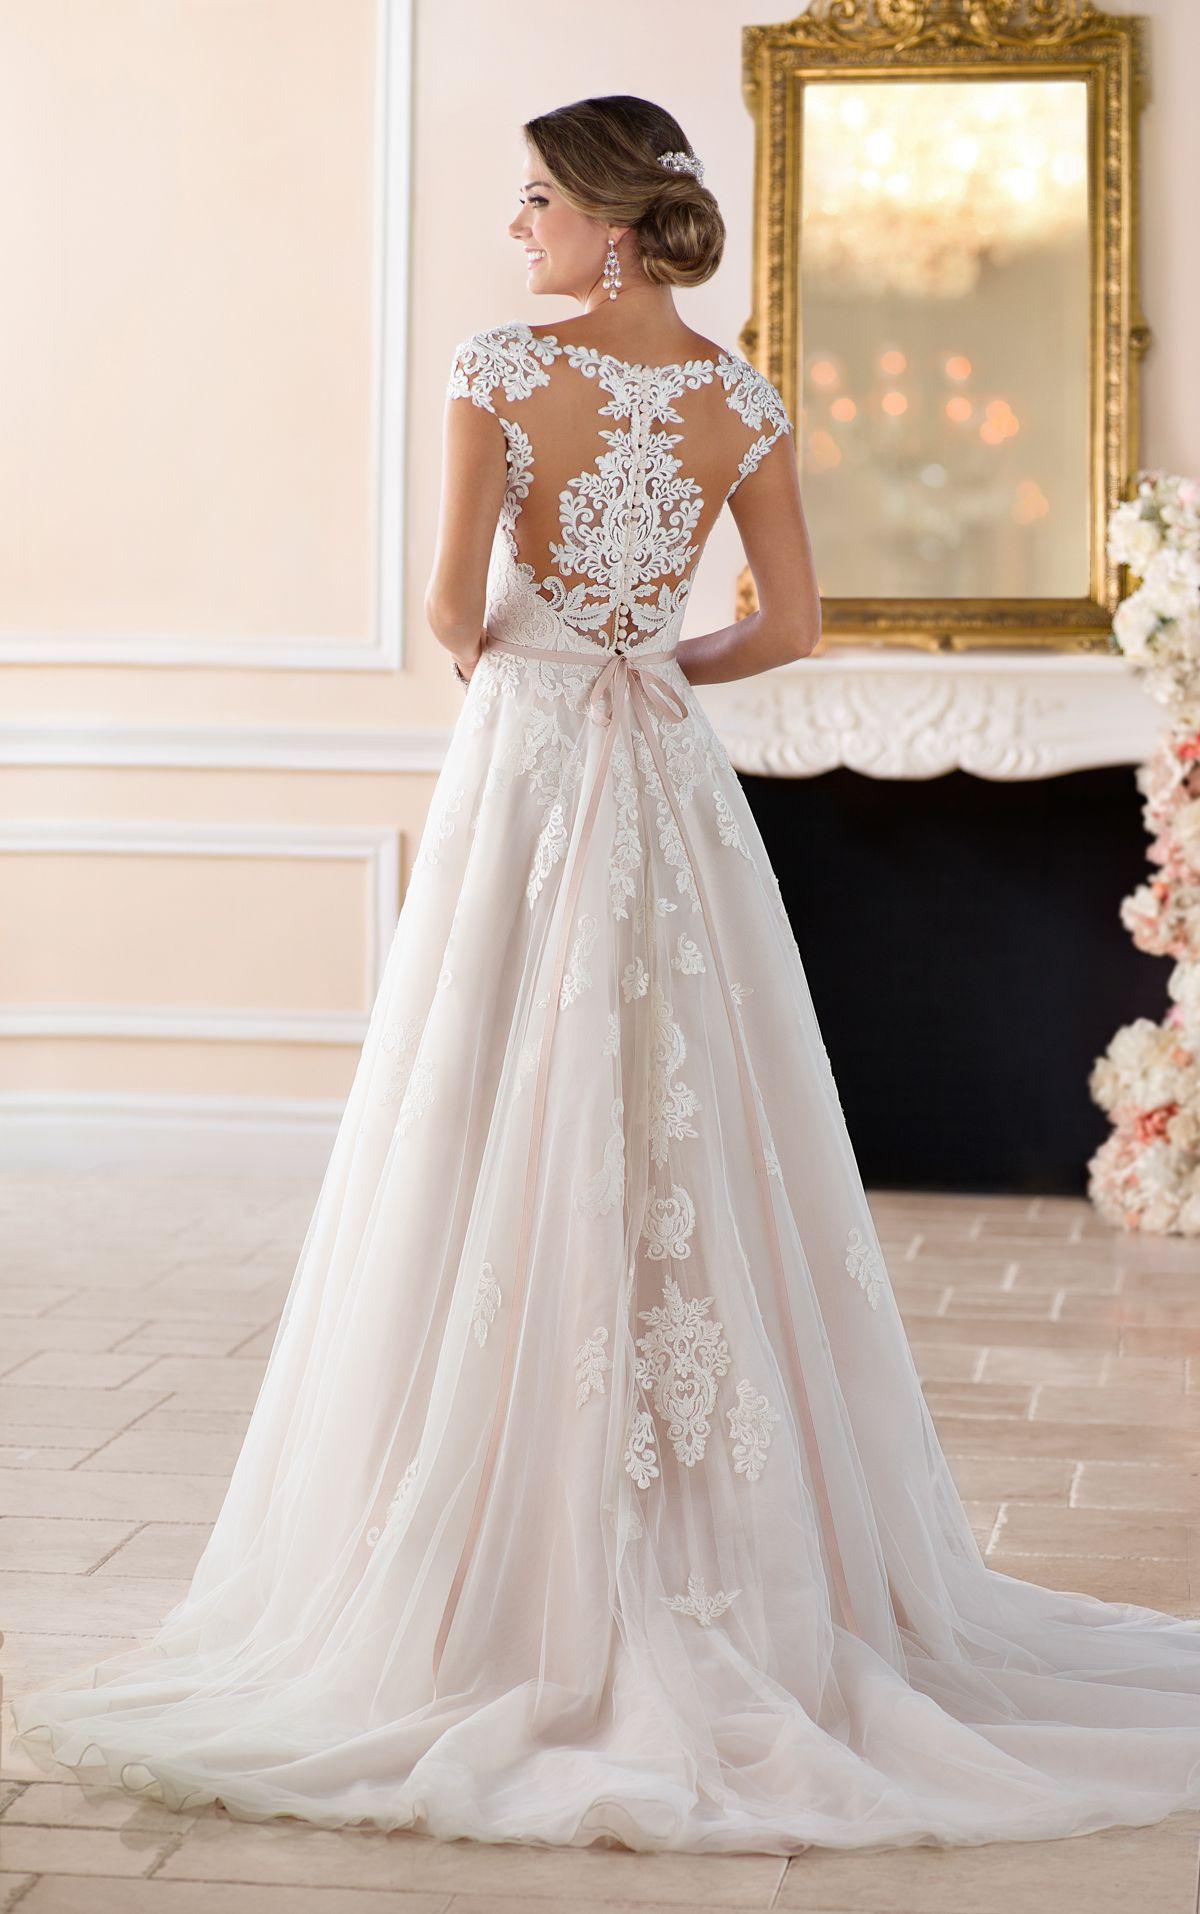 Lace cap sleeve a line wedding dress  Romantic Cap Sleeve Wedding Dress With Cameo Back  Unique dresses